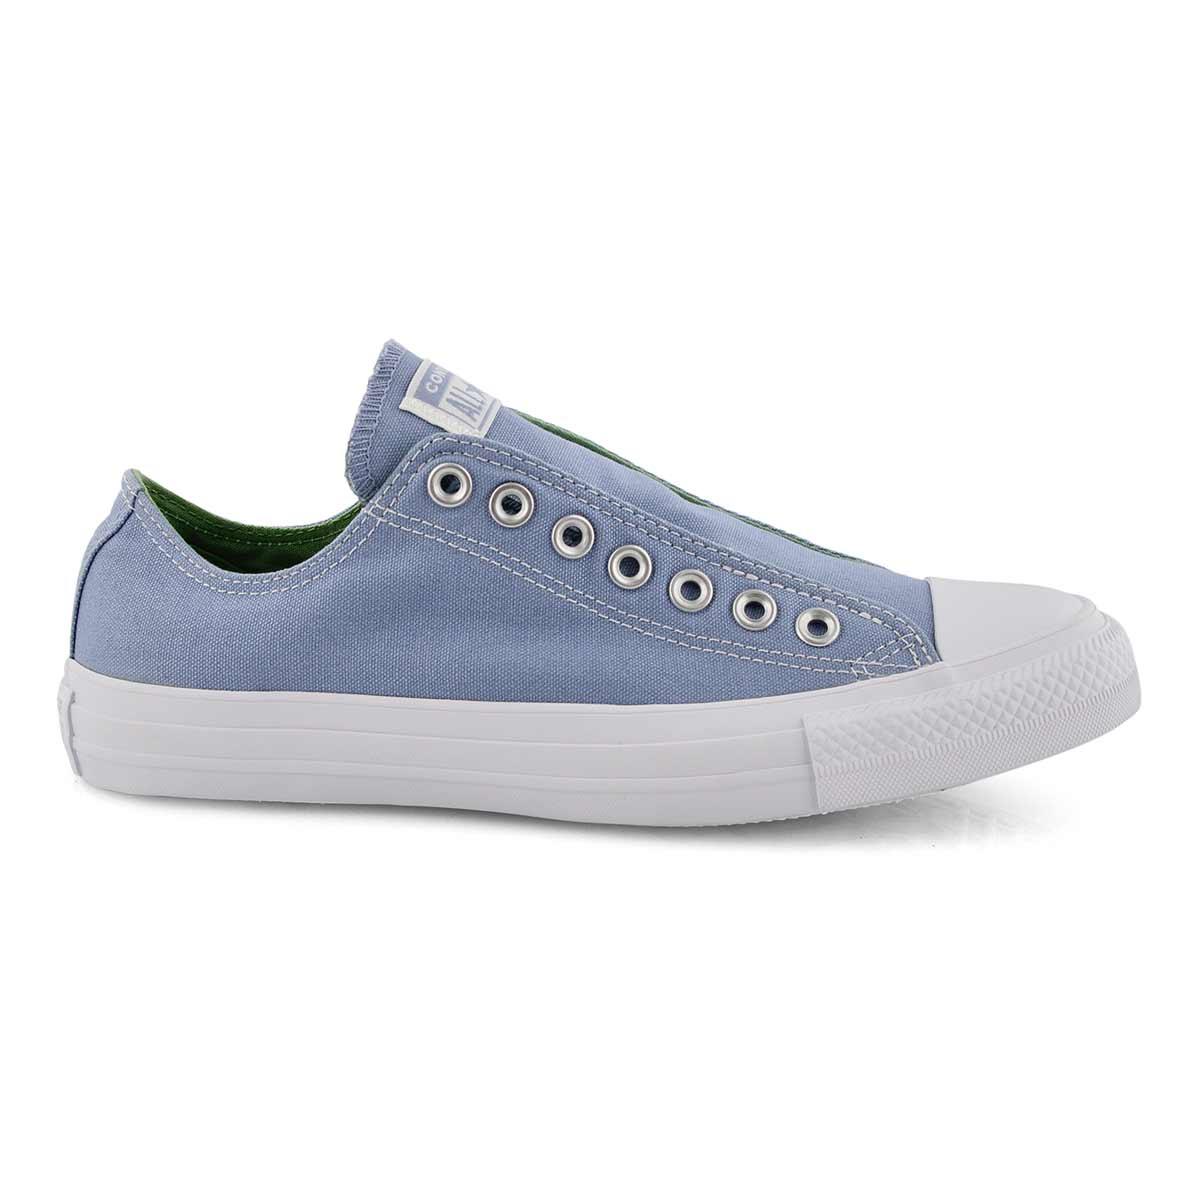 Converse-Women-039-s-Chuck-Taylor-All-Star-Slip-Fashion-Sneaker miniature 14